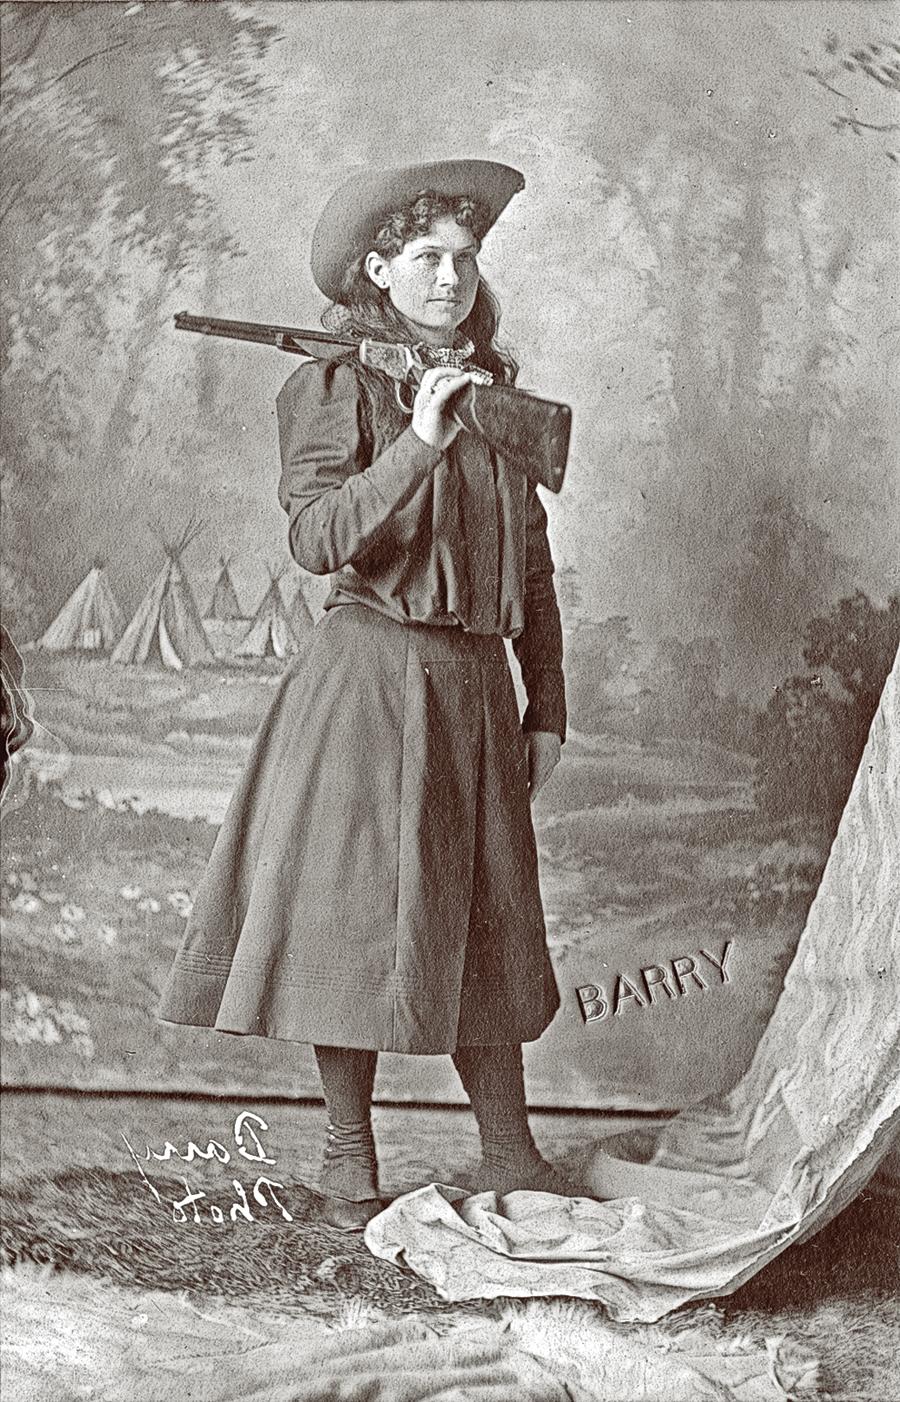 SF_3-HIST-for-GUN-No.-4-BBCW_Annie-Oakley-with-Winchester-1892-pointing-gun-backwards-P.69.1166